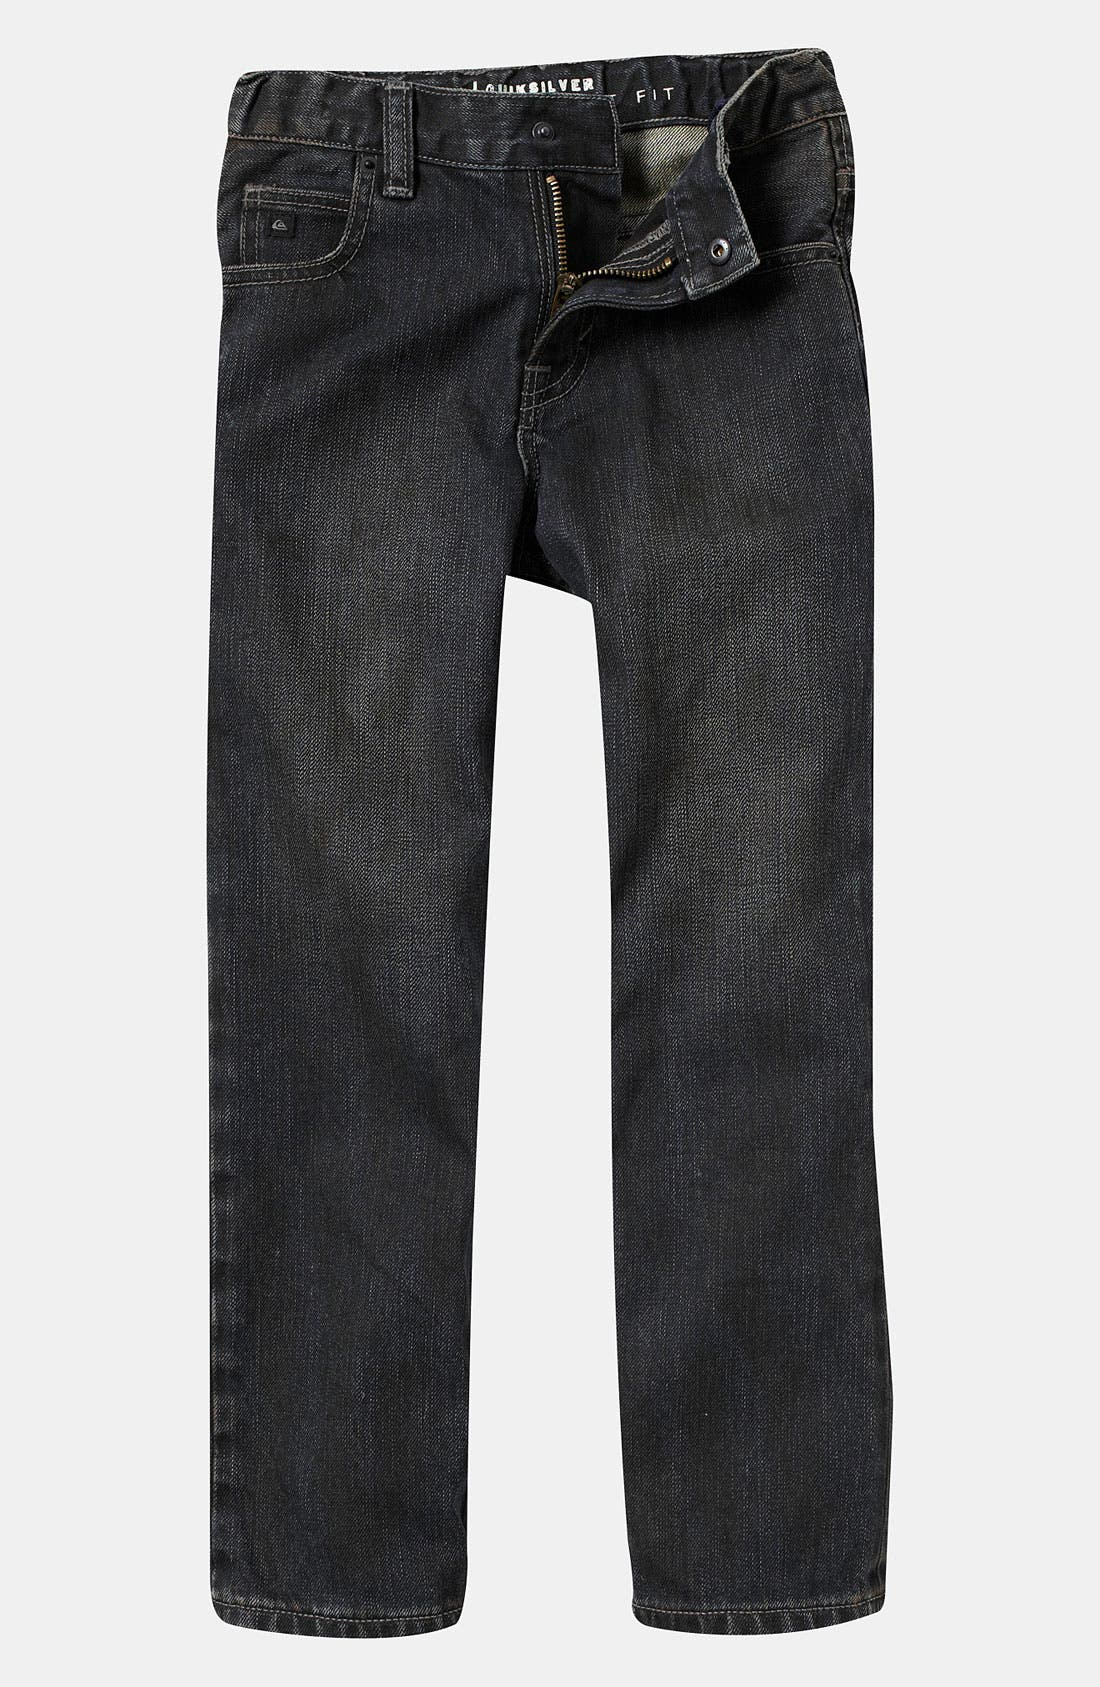 Alternate Image 2  - Quiksilver 'Revolver' Jeans (Toddler)